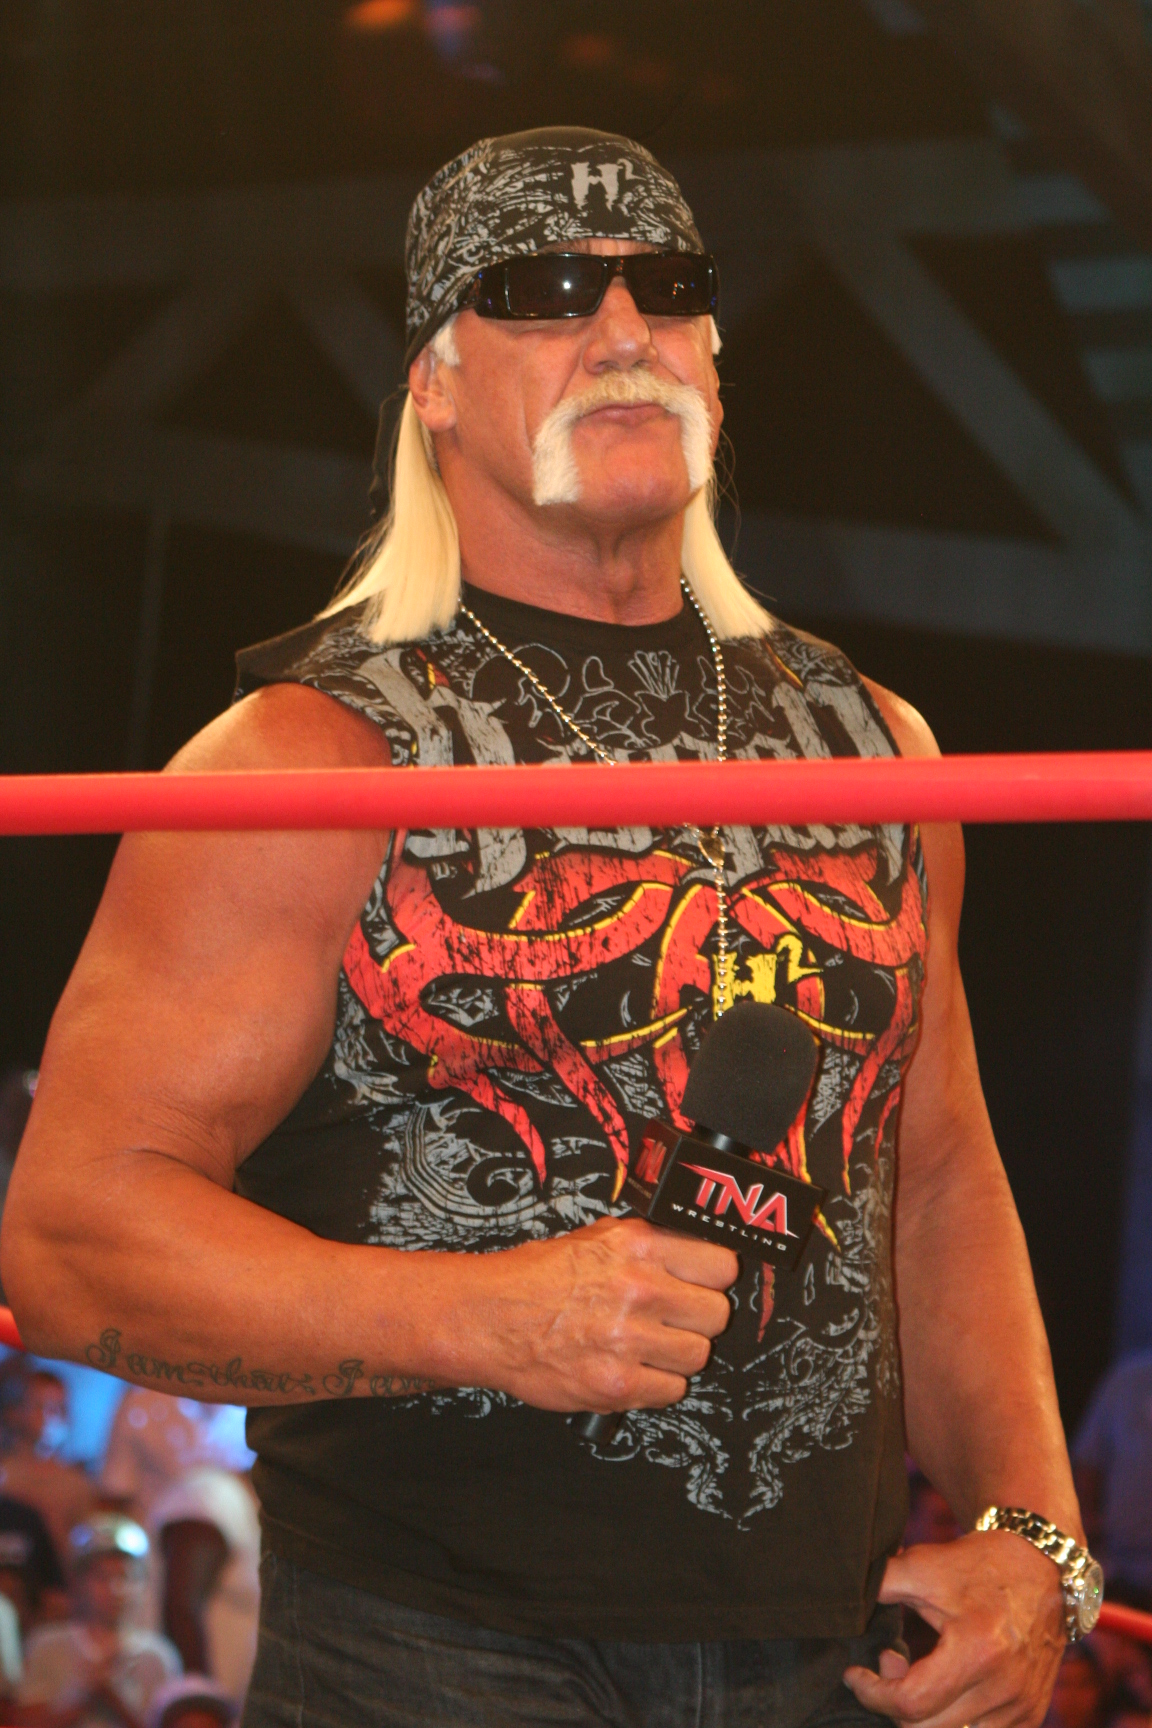 Hulk Hogan - Animal Rights Activist, Athlete, Reality Television Star ...